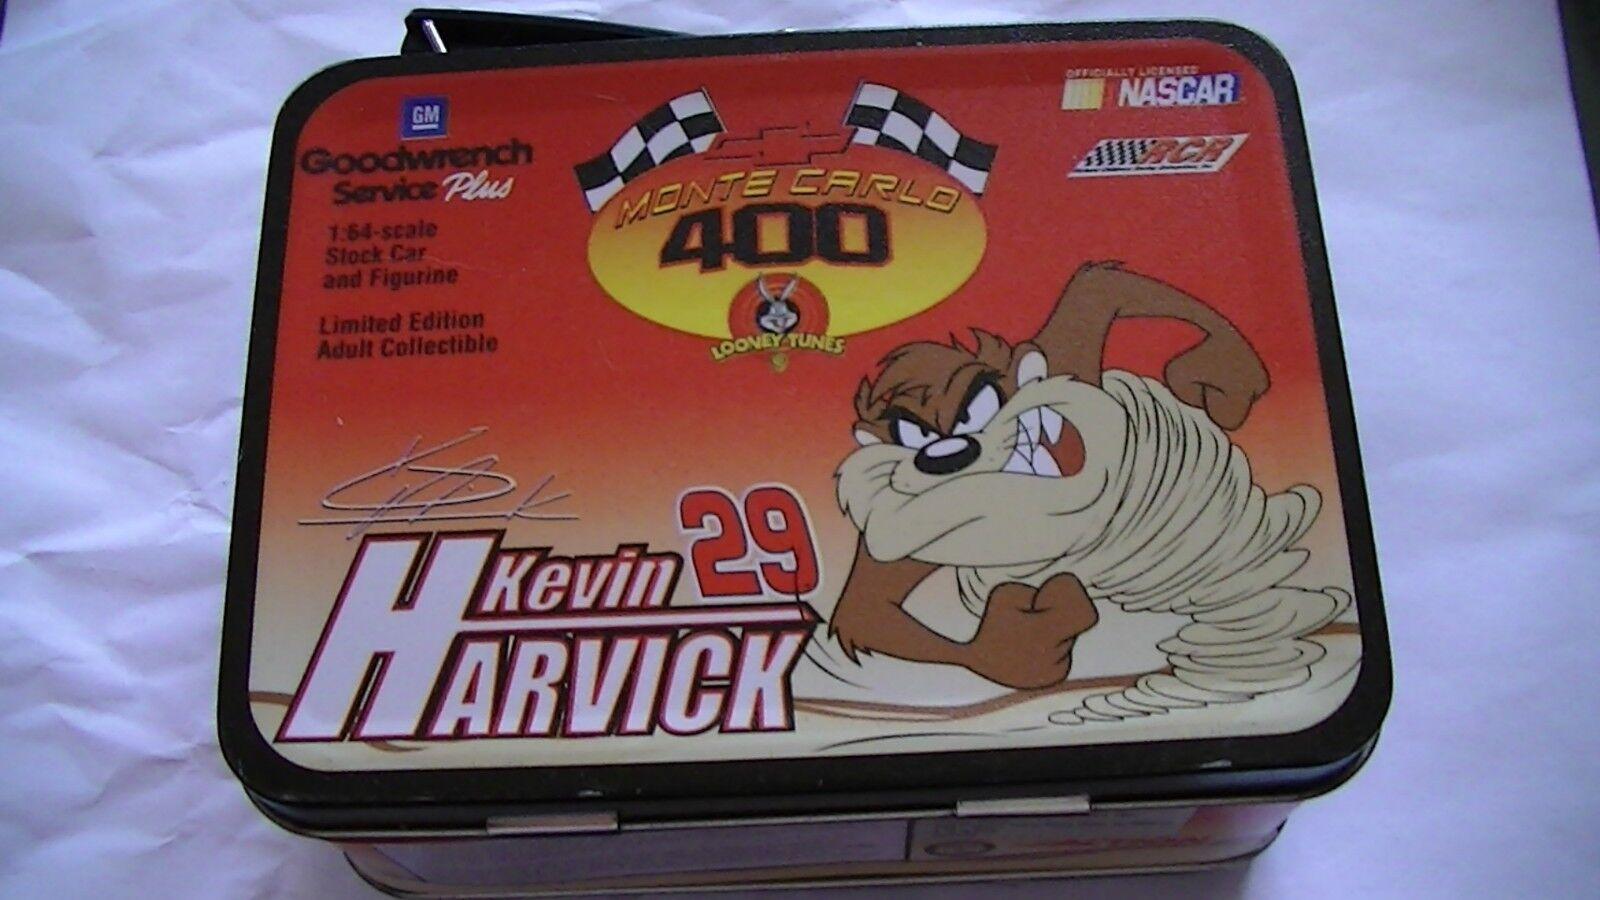 Coffret voitures neuves nascar rallye 1 64 Kevin HarvickEdition limitée 1 4008